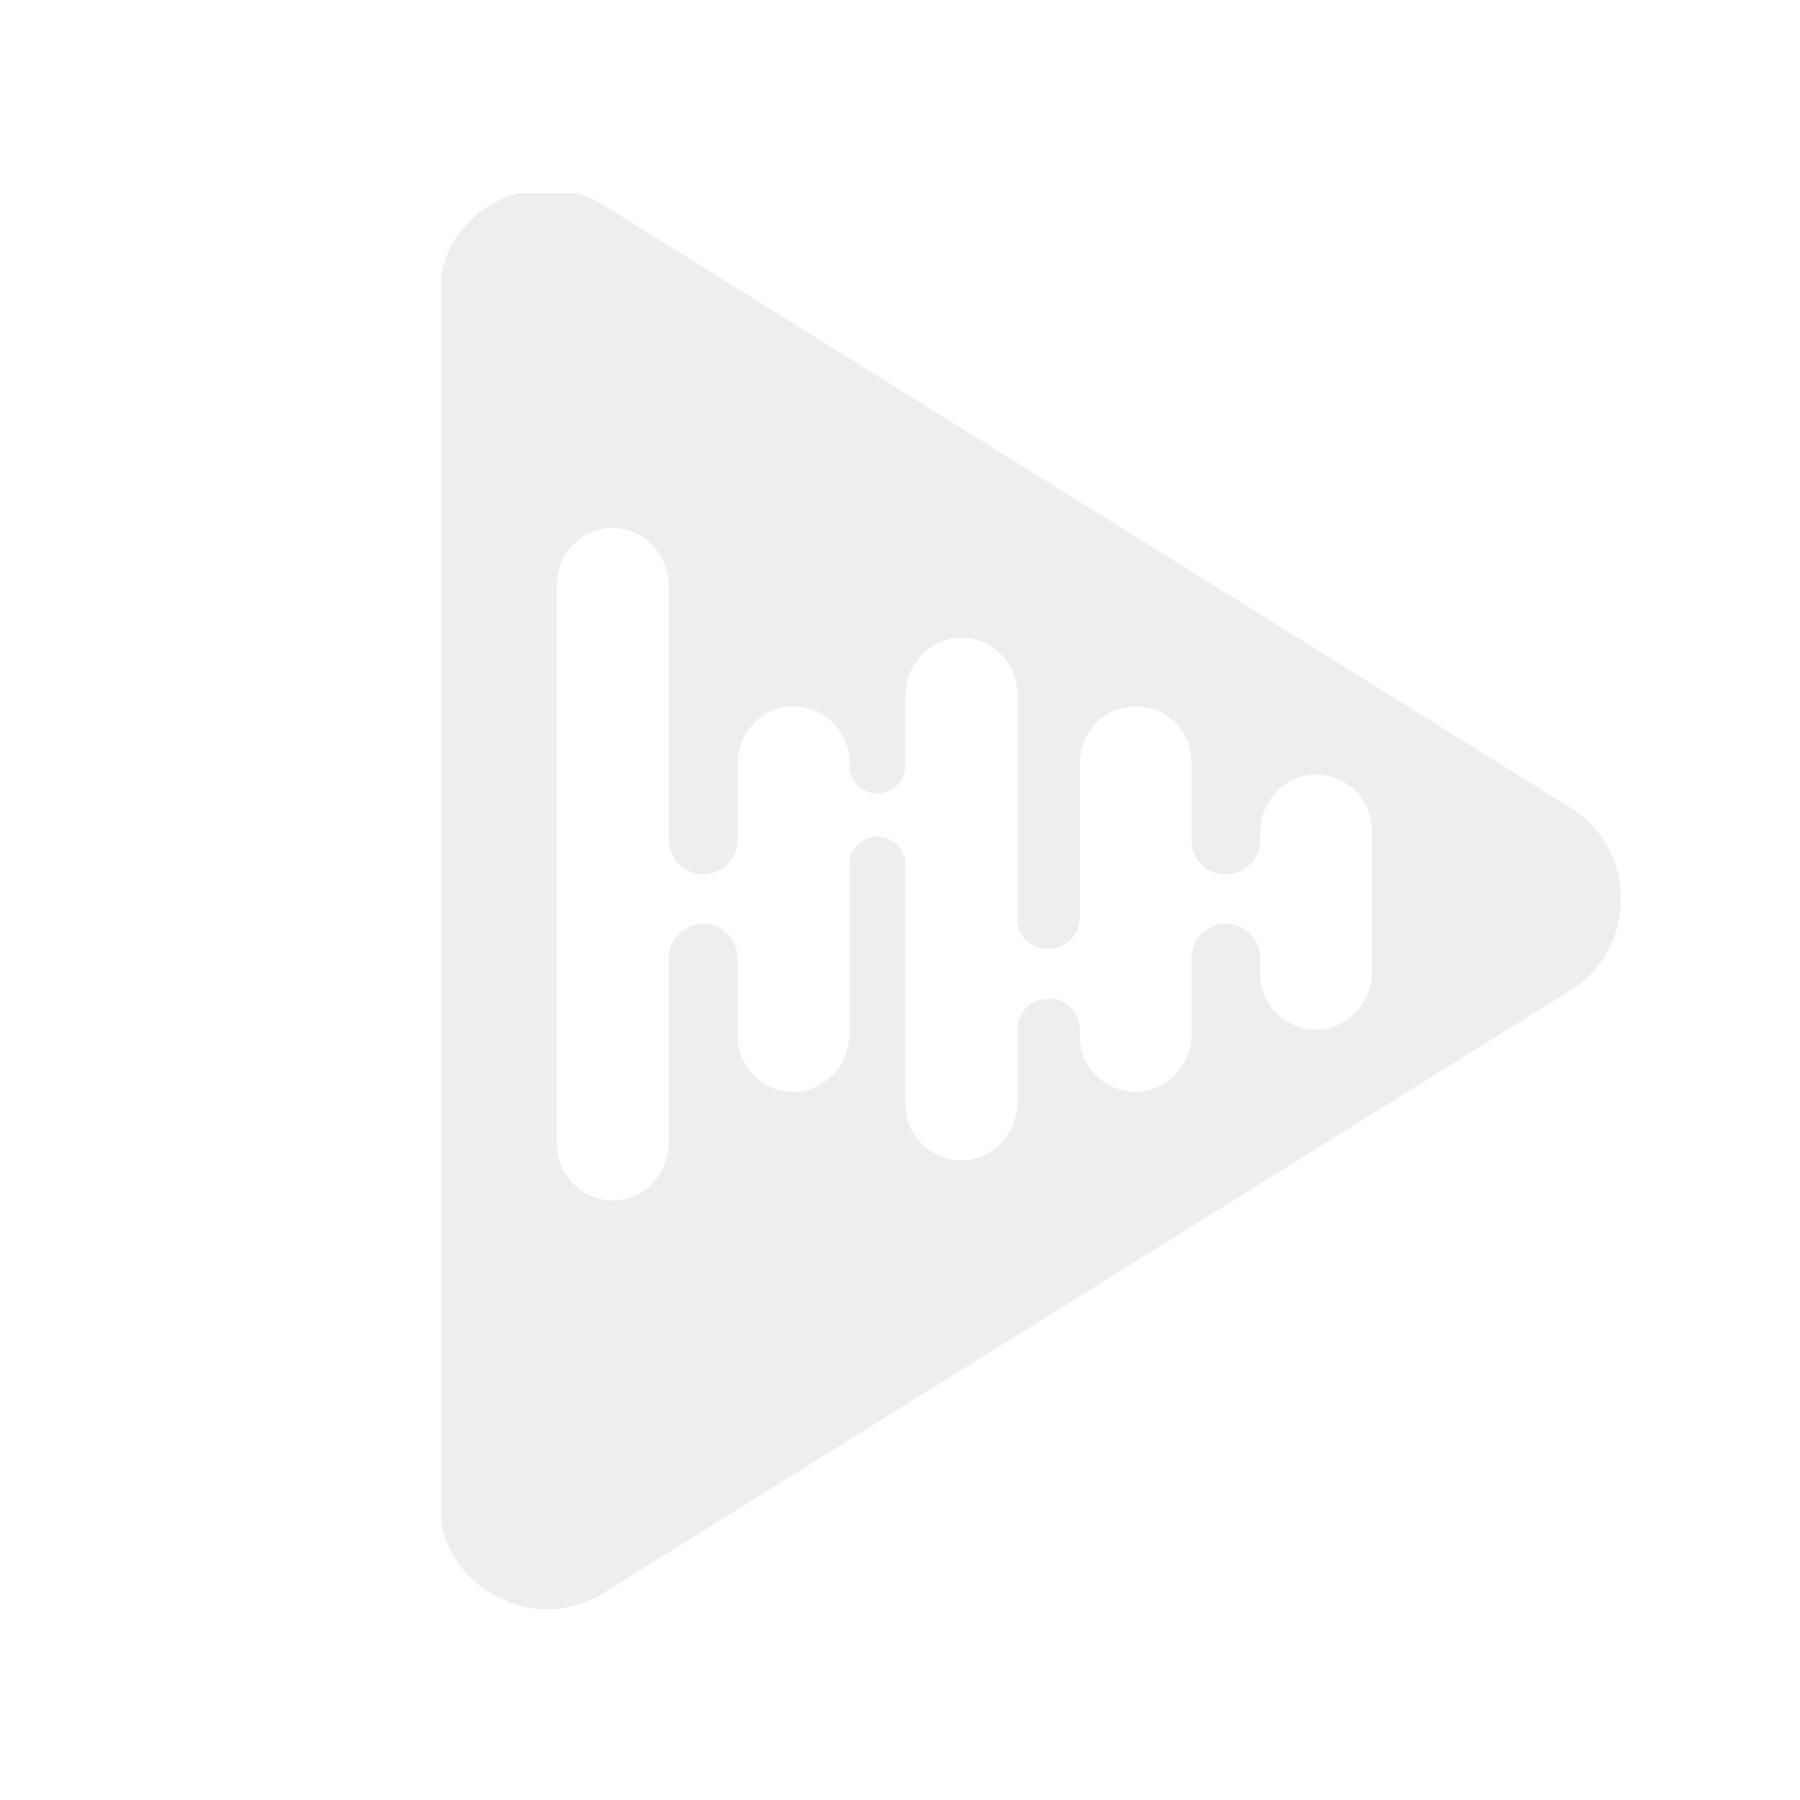 Skoddejuice Black Cherry Aroma